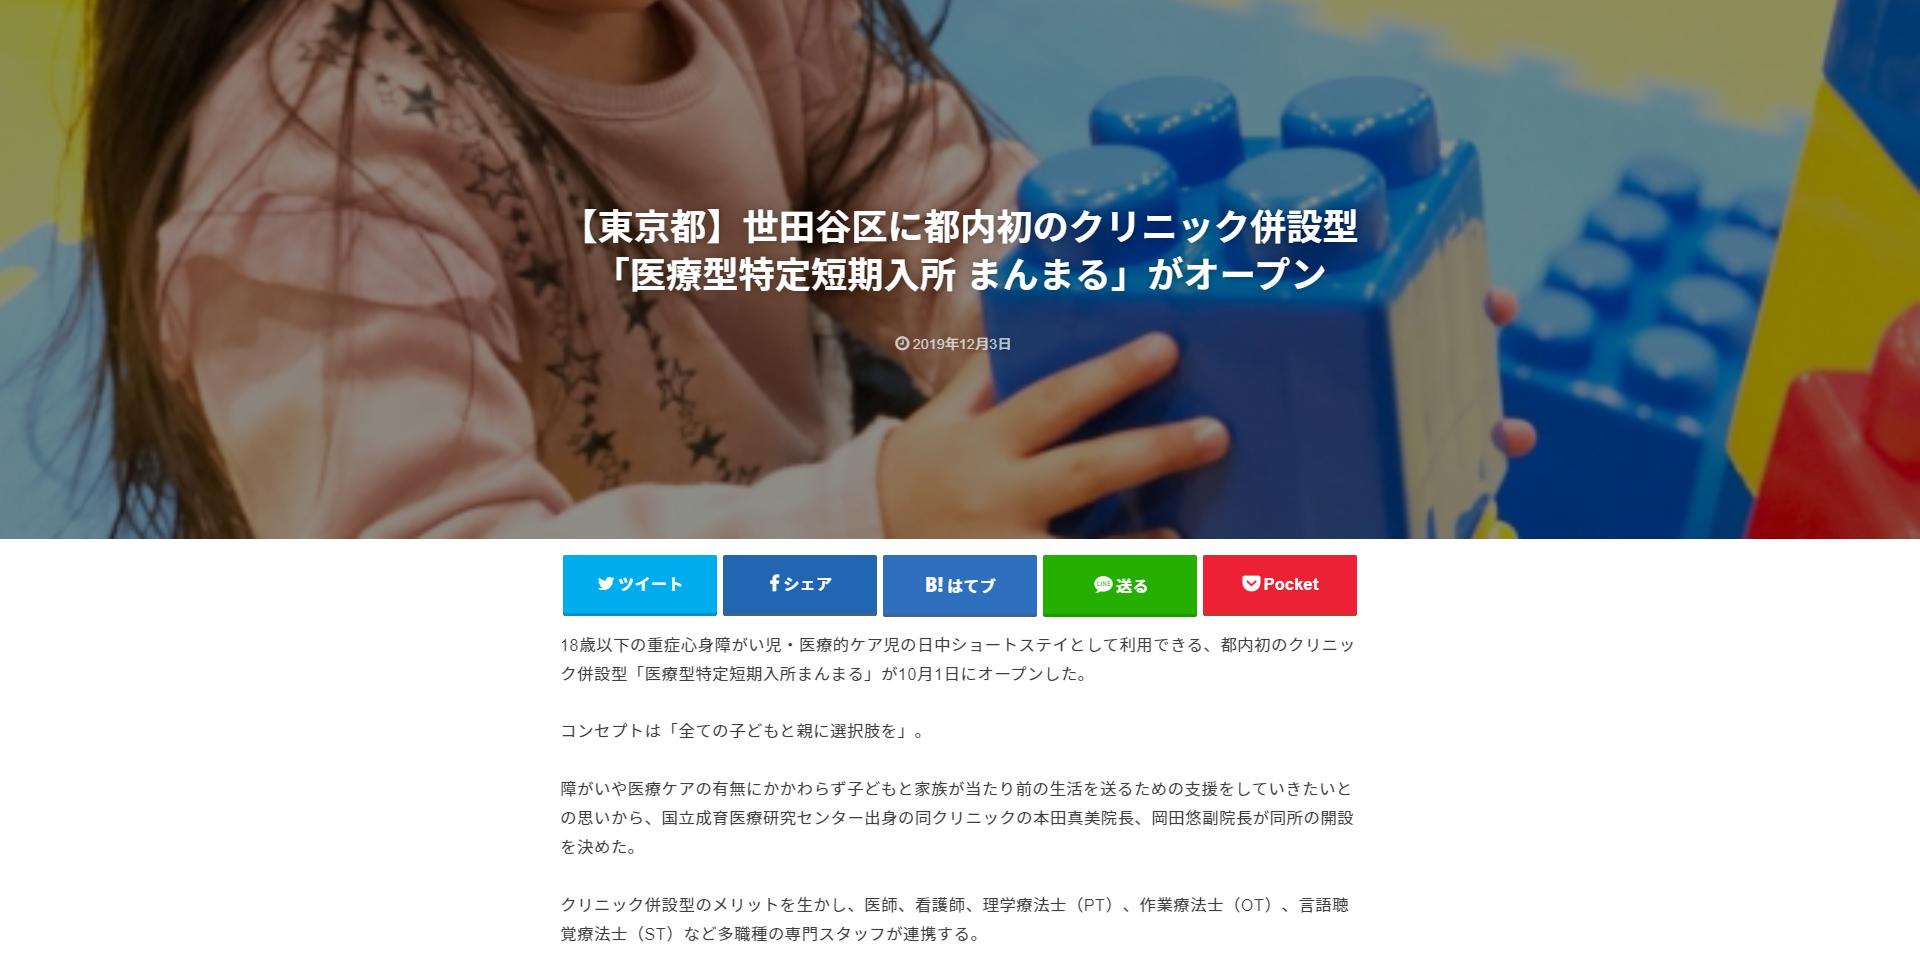 FireShot Capture 340 - 【東京都】世田谷区に都内初のクリニック併設型「医療型特定短期入所 まんまる」がオープン - アンリーシュ 医療的ケア児と家族に役立つメディ_ - unleash.or.jp